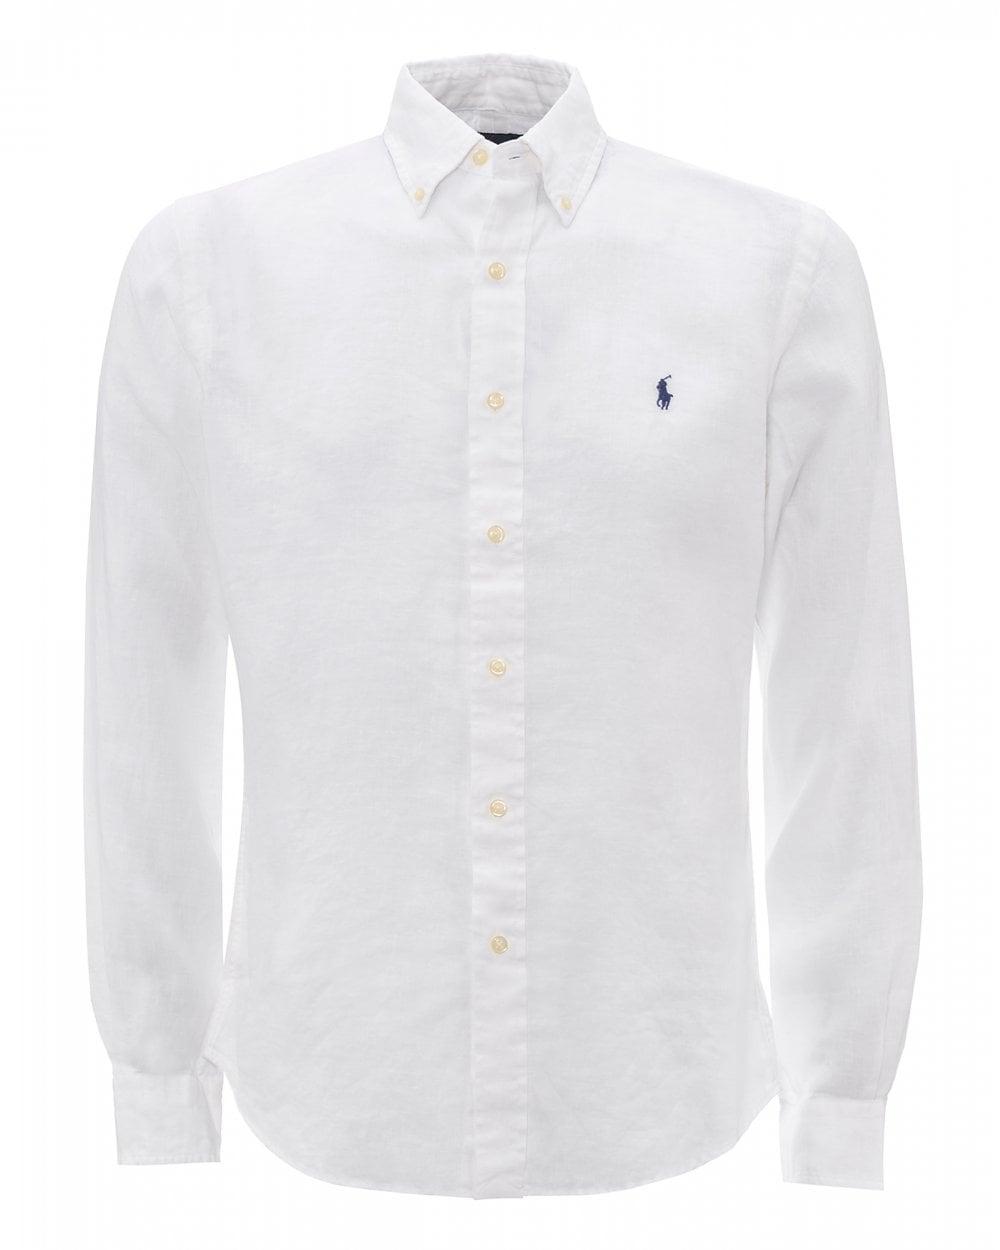 d52f3df8d Ralph Lauren Mens Pure White Slim Fit Linen Shirt